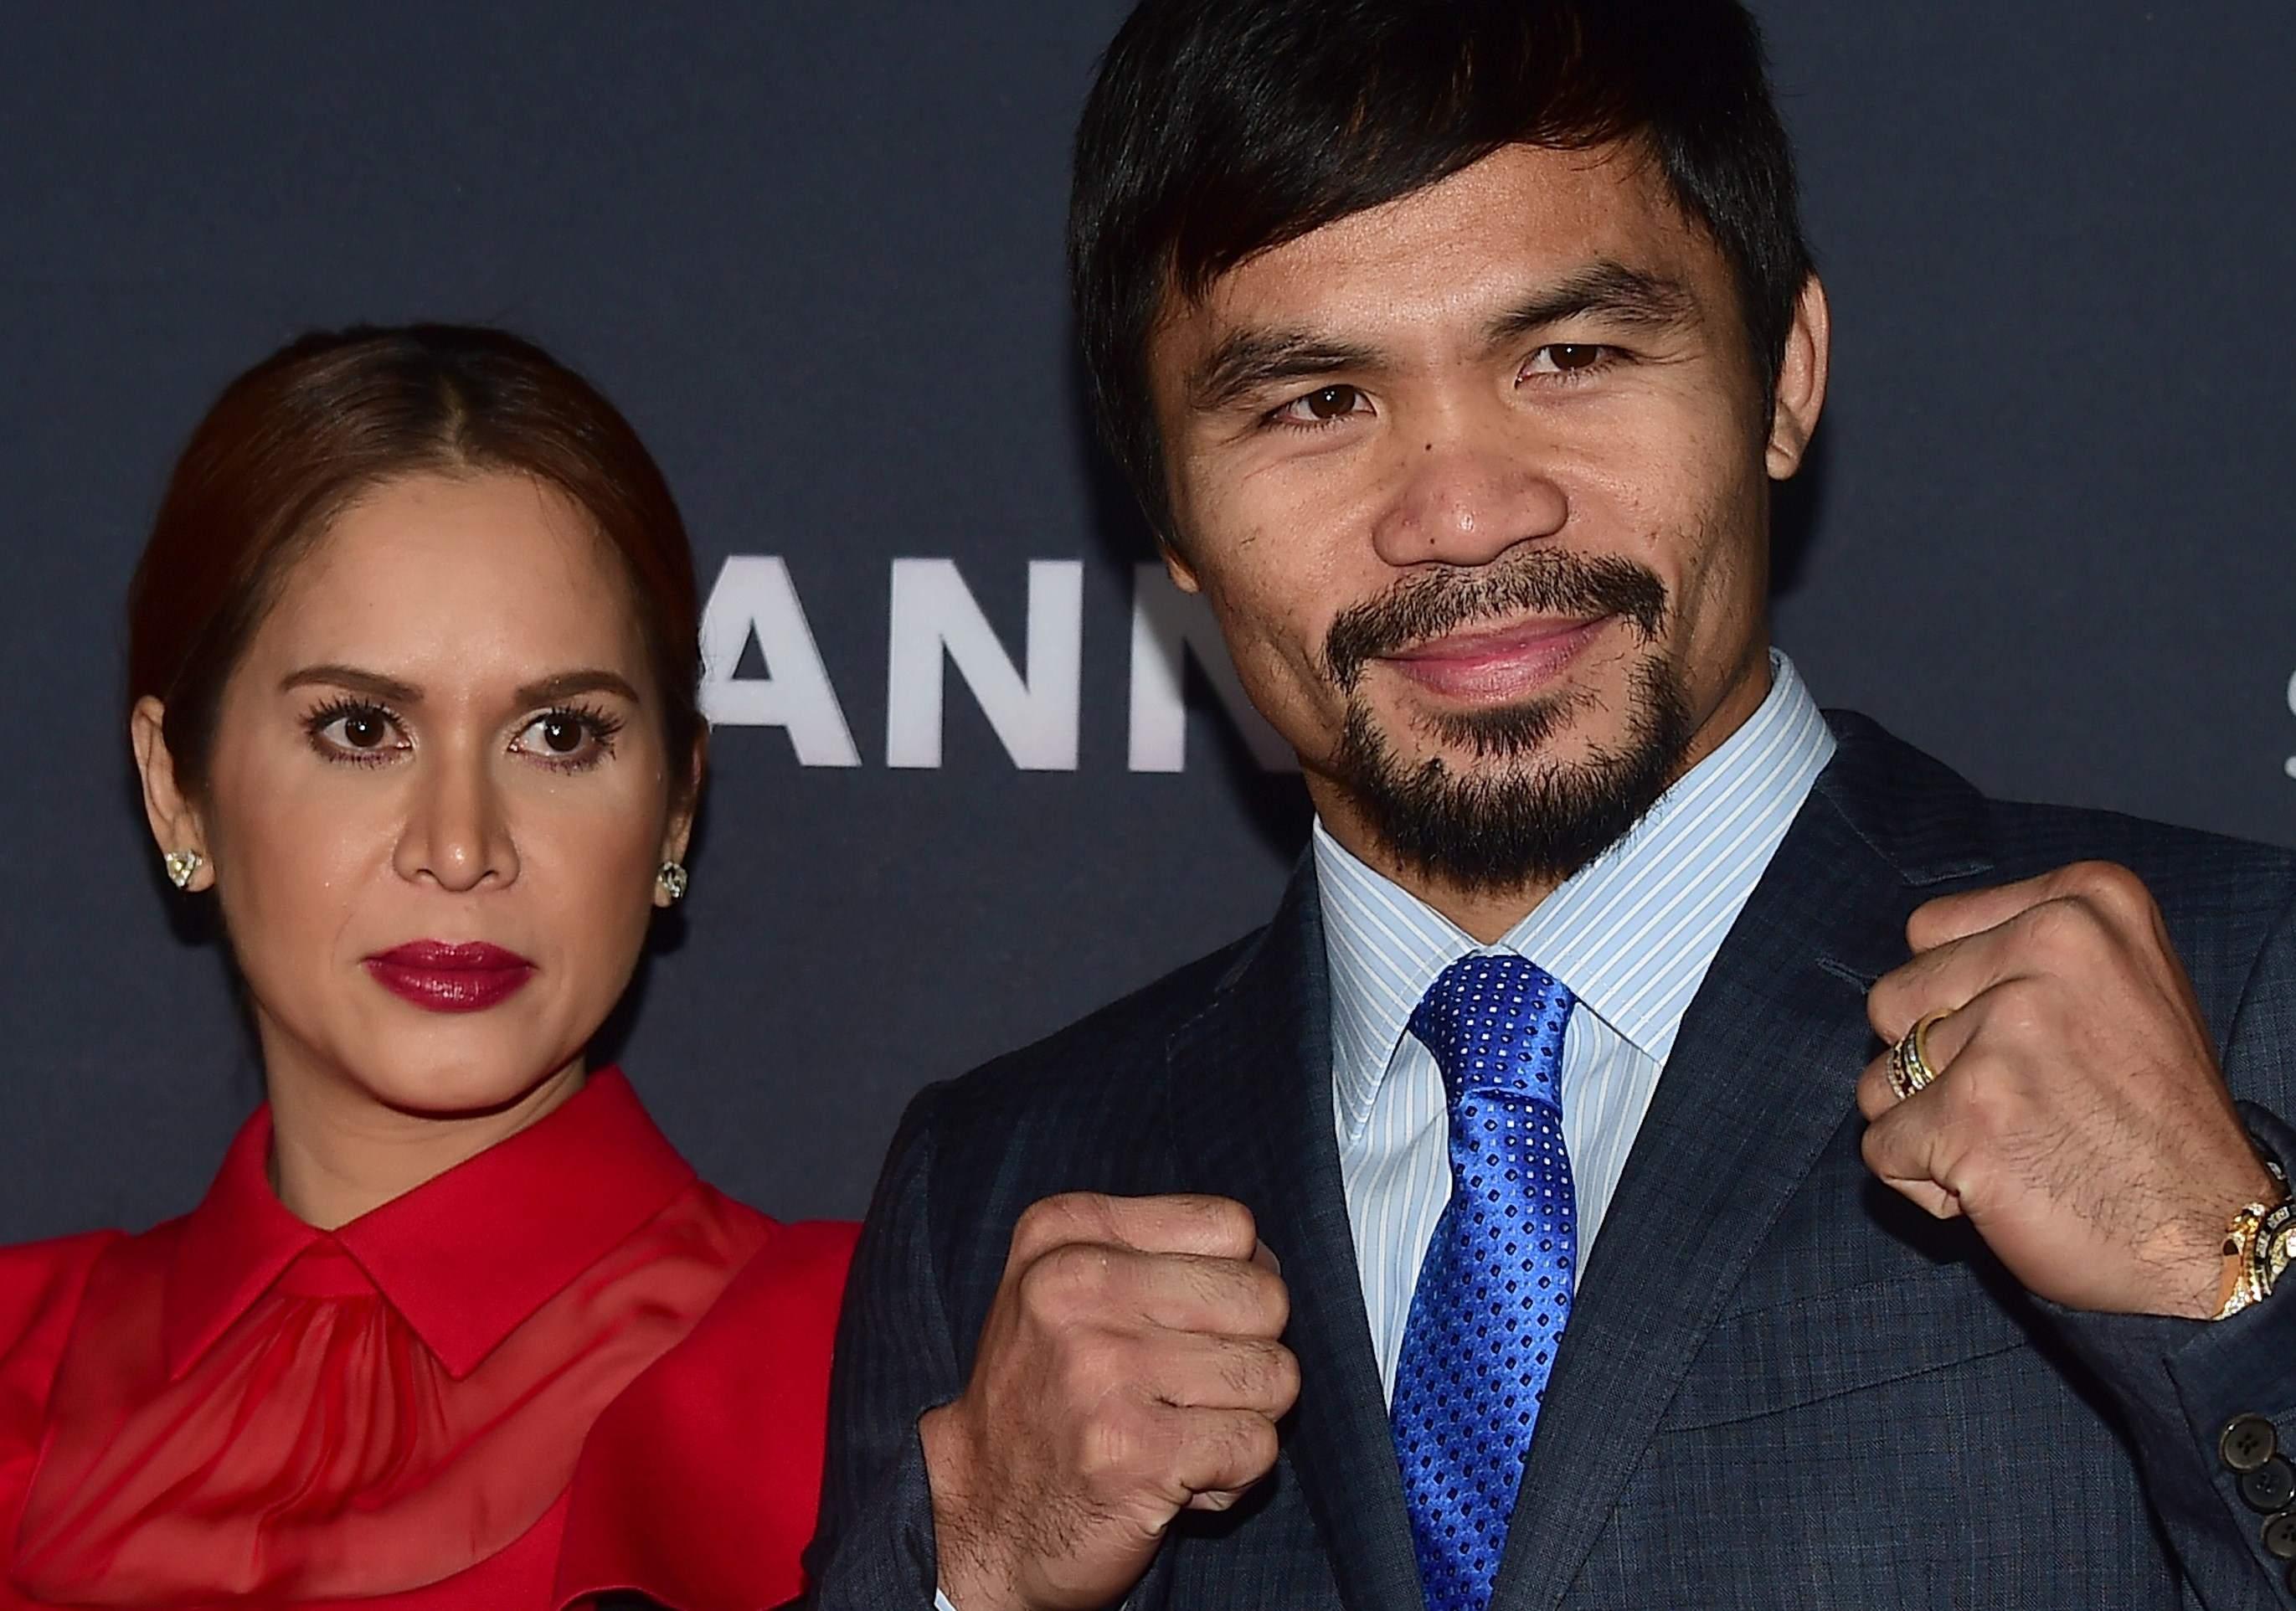 Manny Pacquiao mujer, Manny Pacquiao esposa, Manny Pacquiao novia, Manny Pacquiao familia,